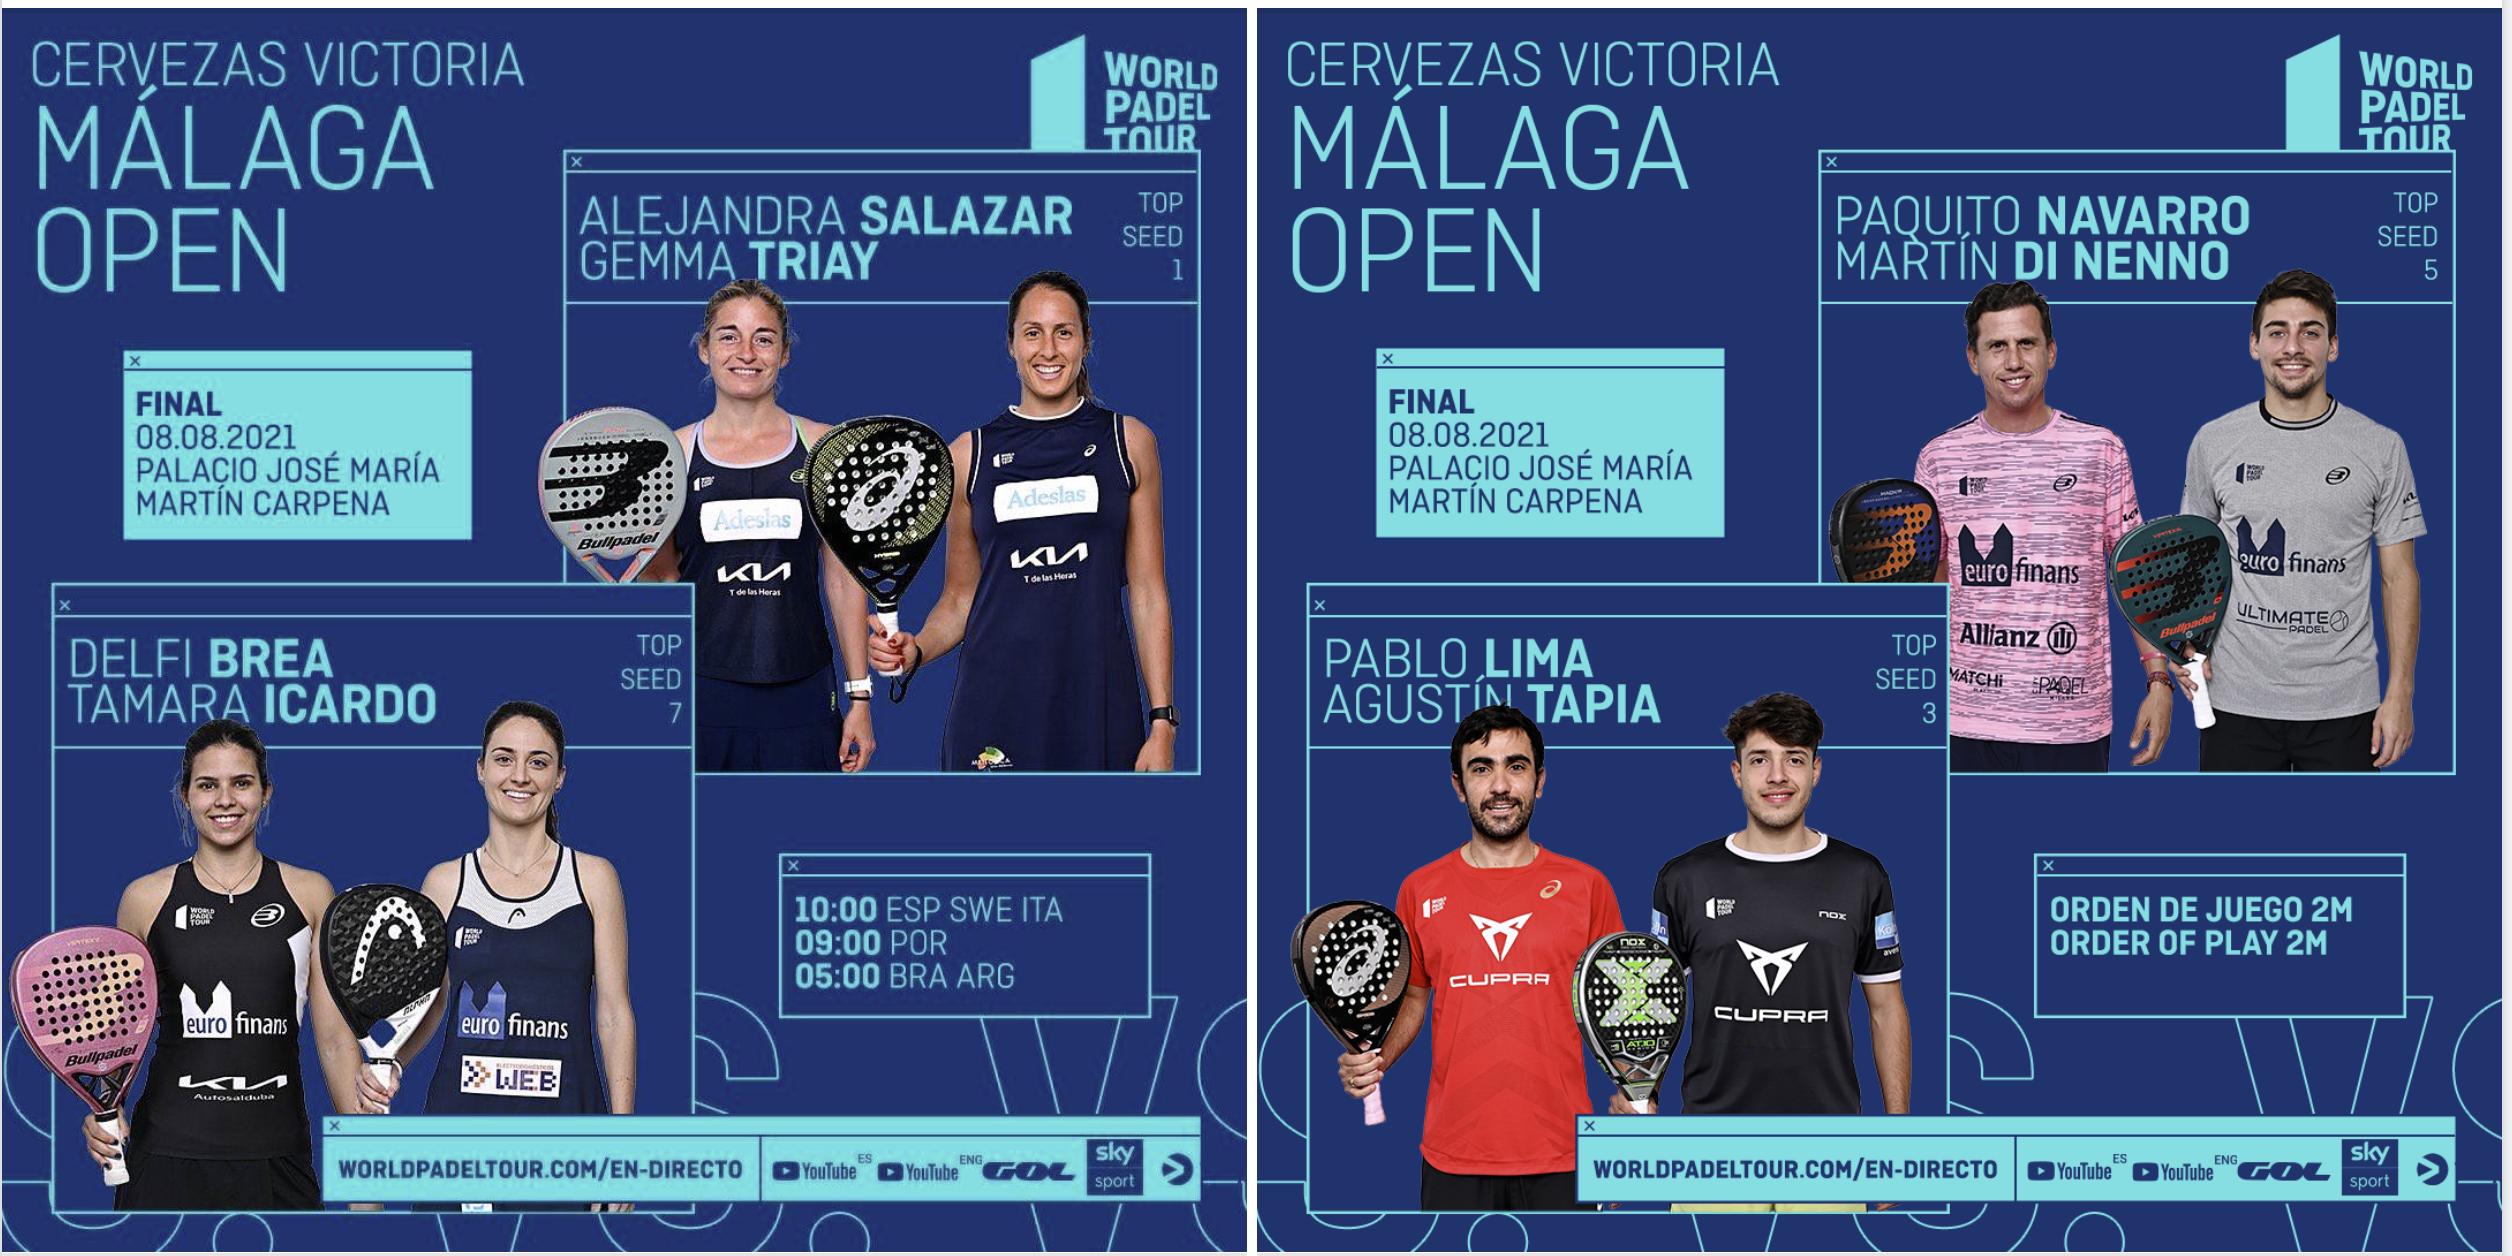 finales world padel tour open malaga 2021